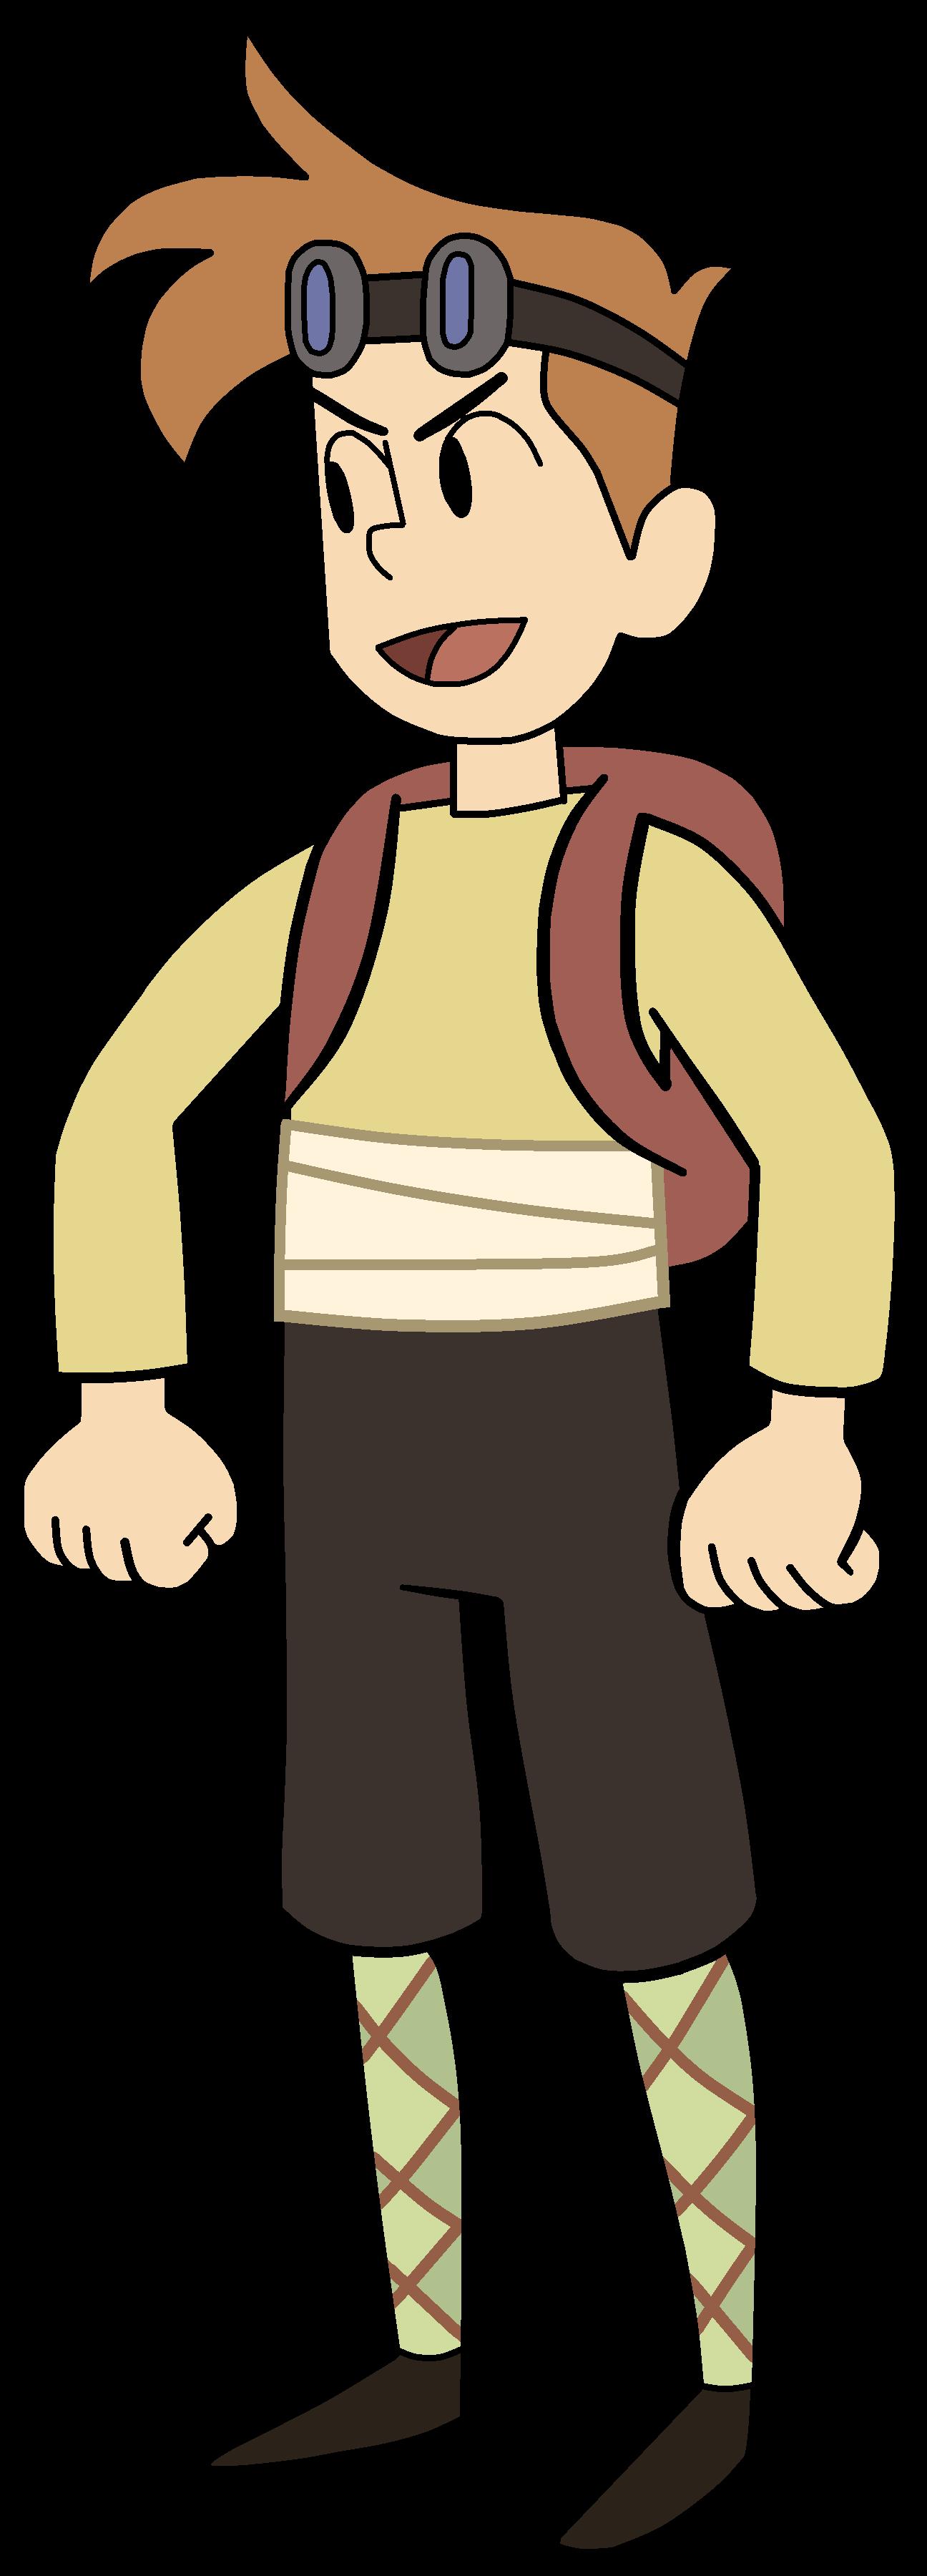 Minor Characters/Fictional